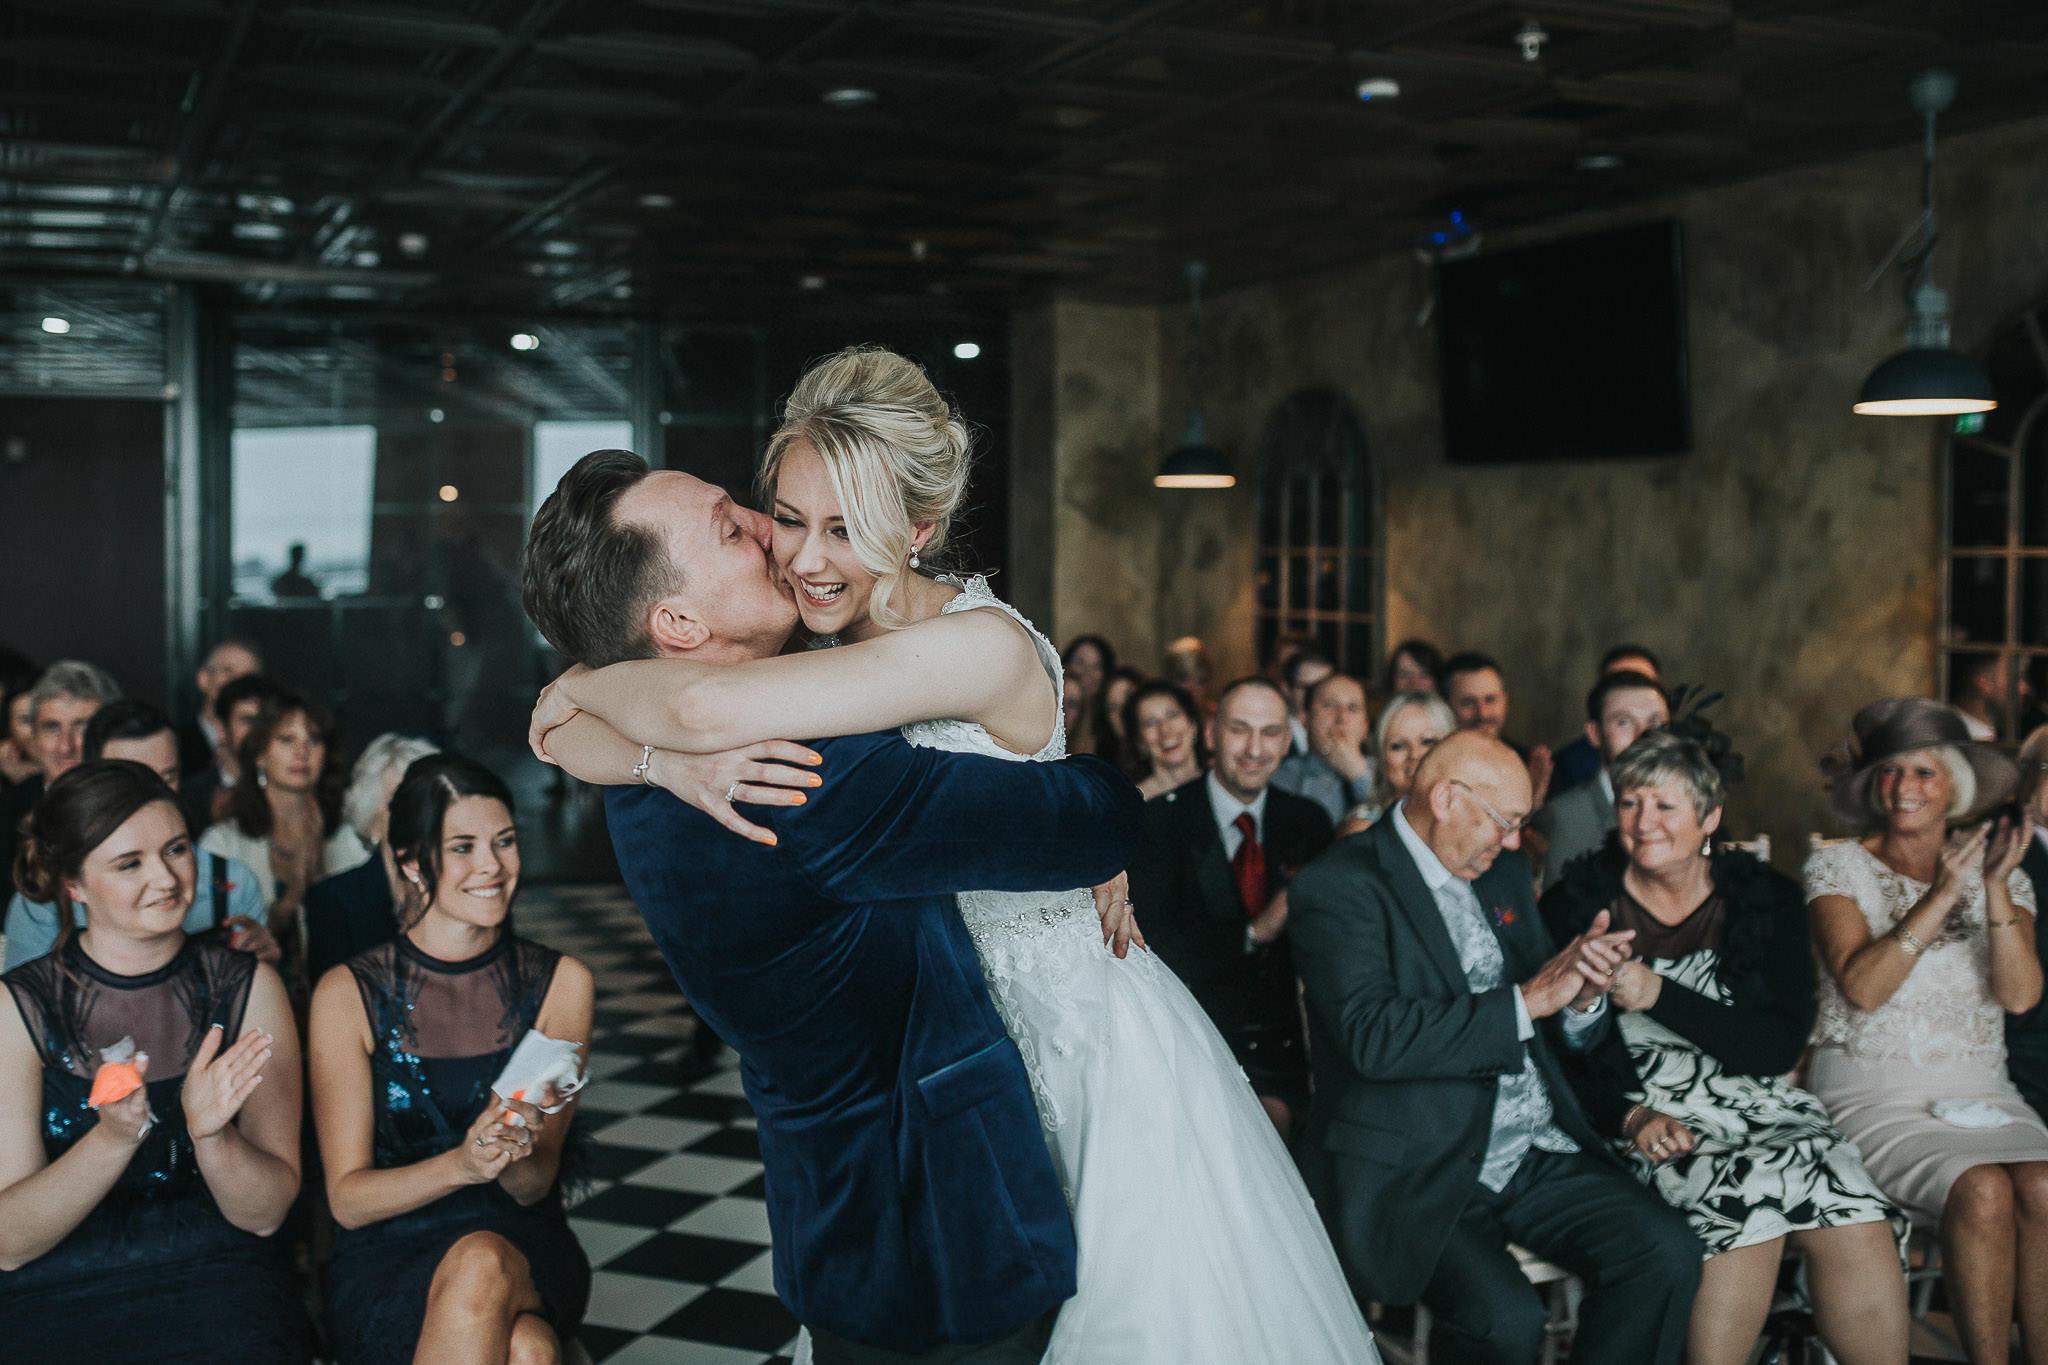 Staffordshire-Wedding-Photographer-178.jpg